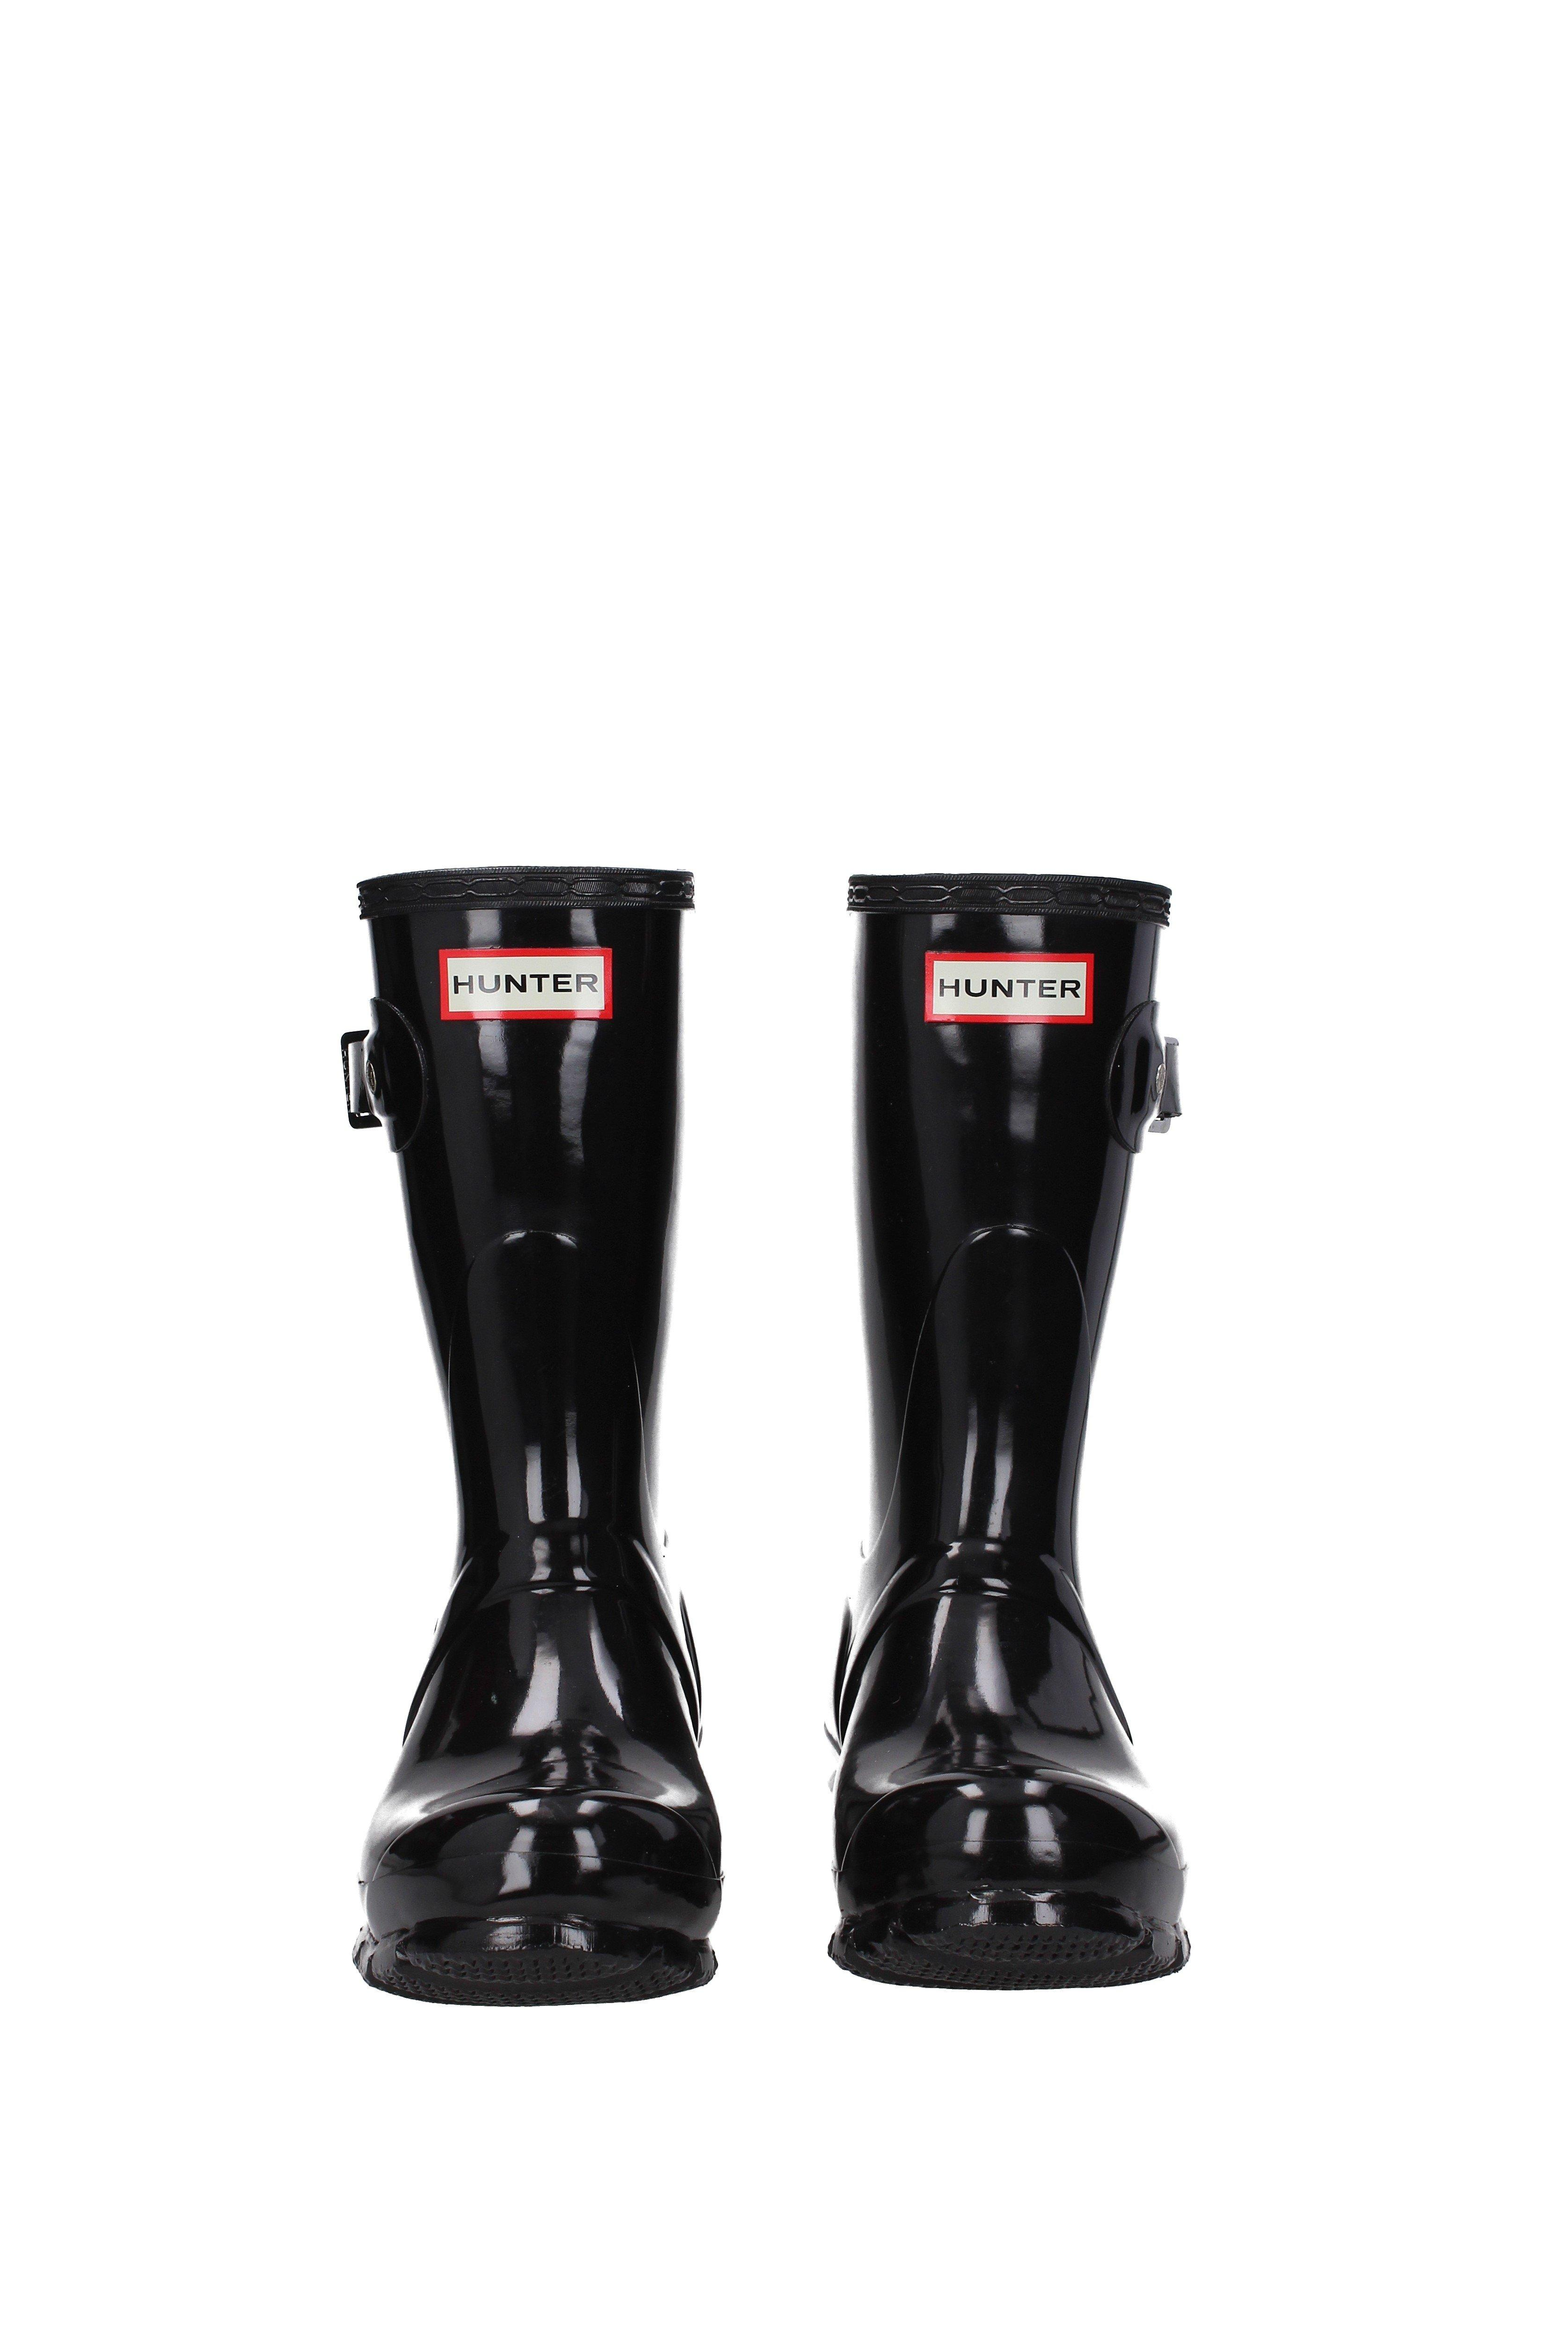 ef391946bda Lyst - HUNTER Ankle Boots Women Black in Black